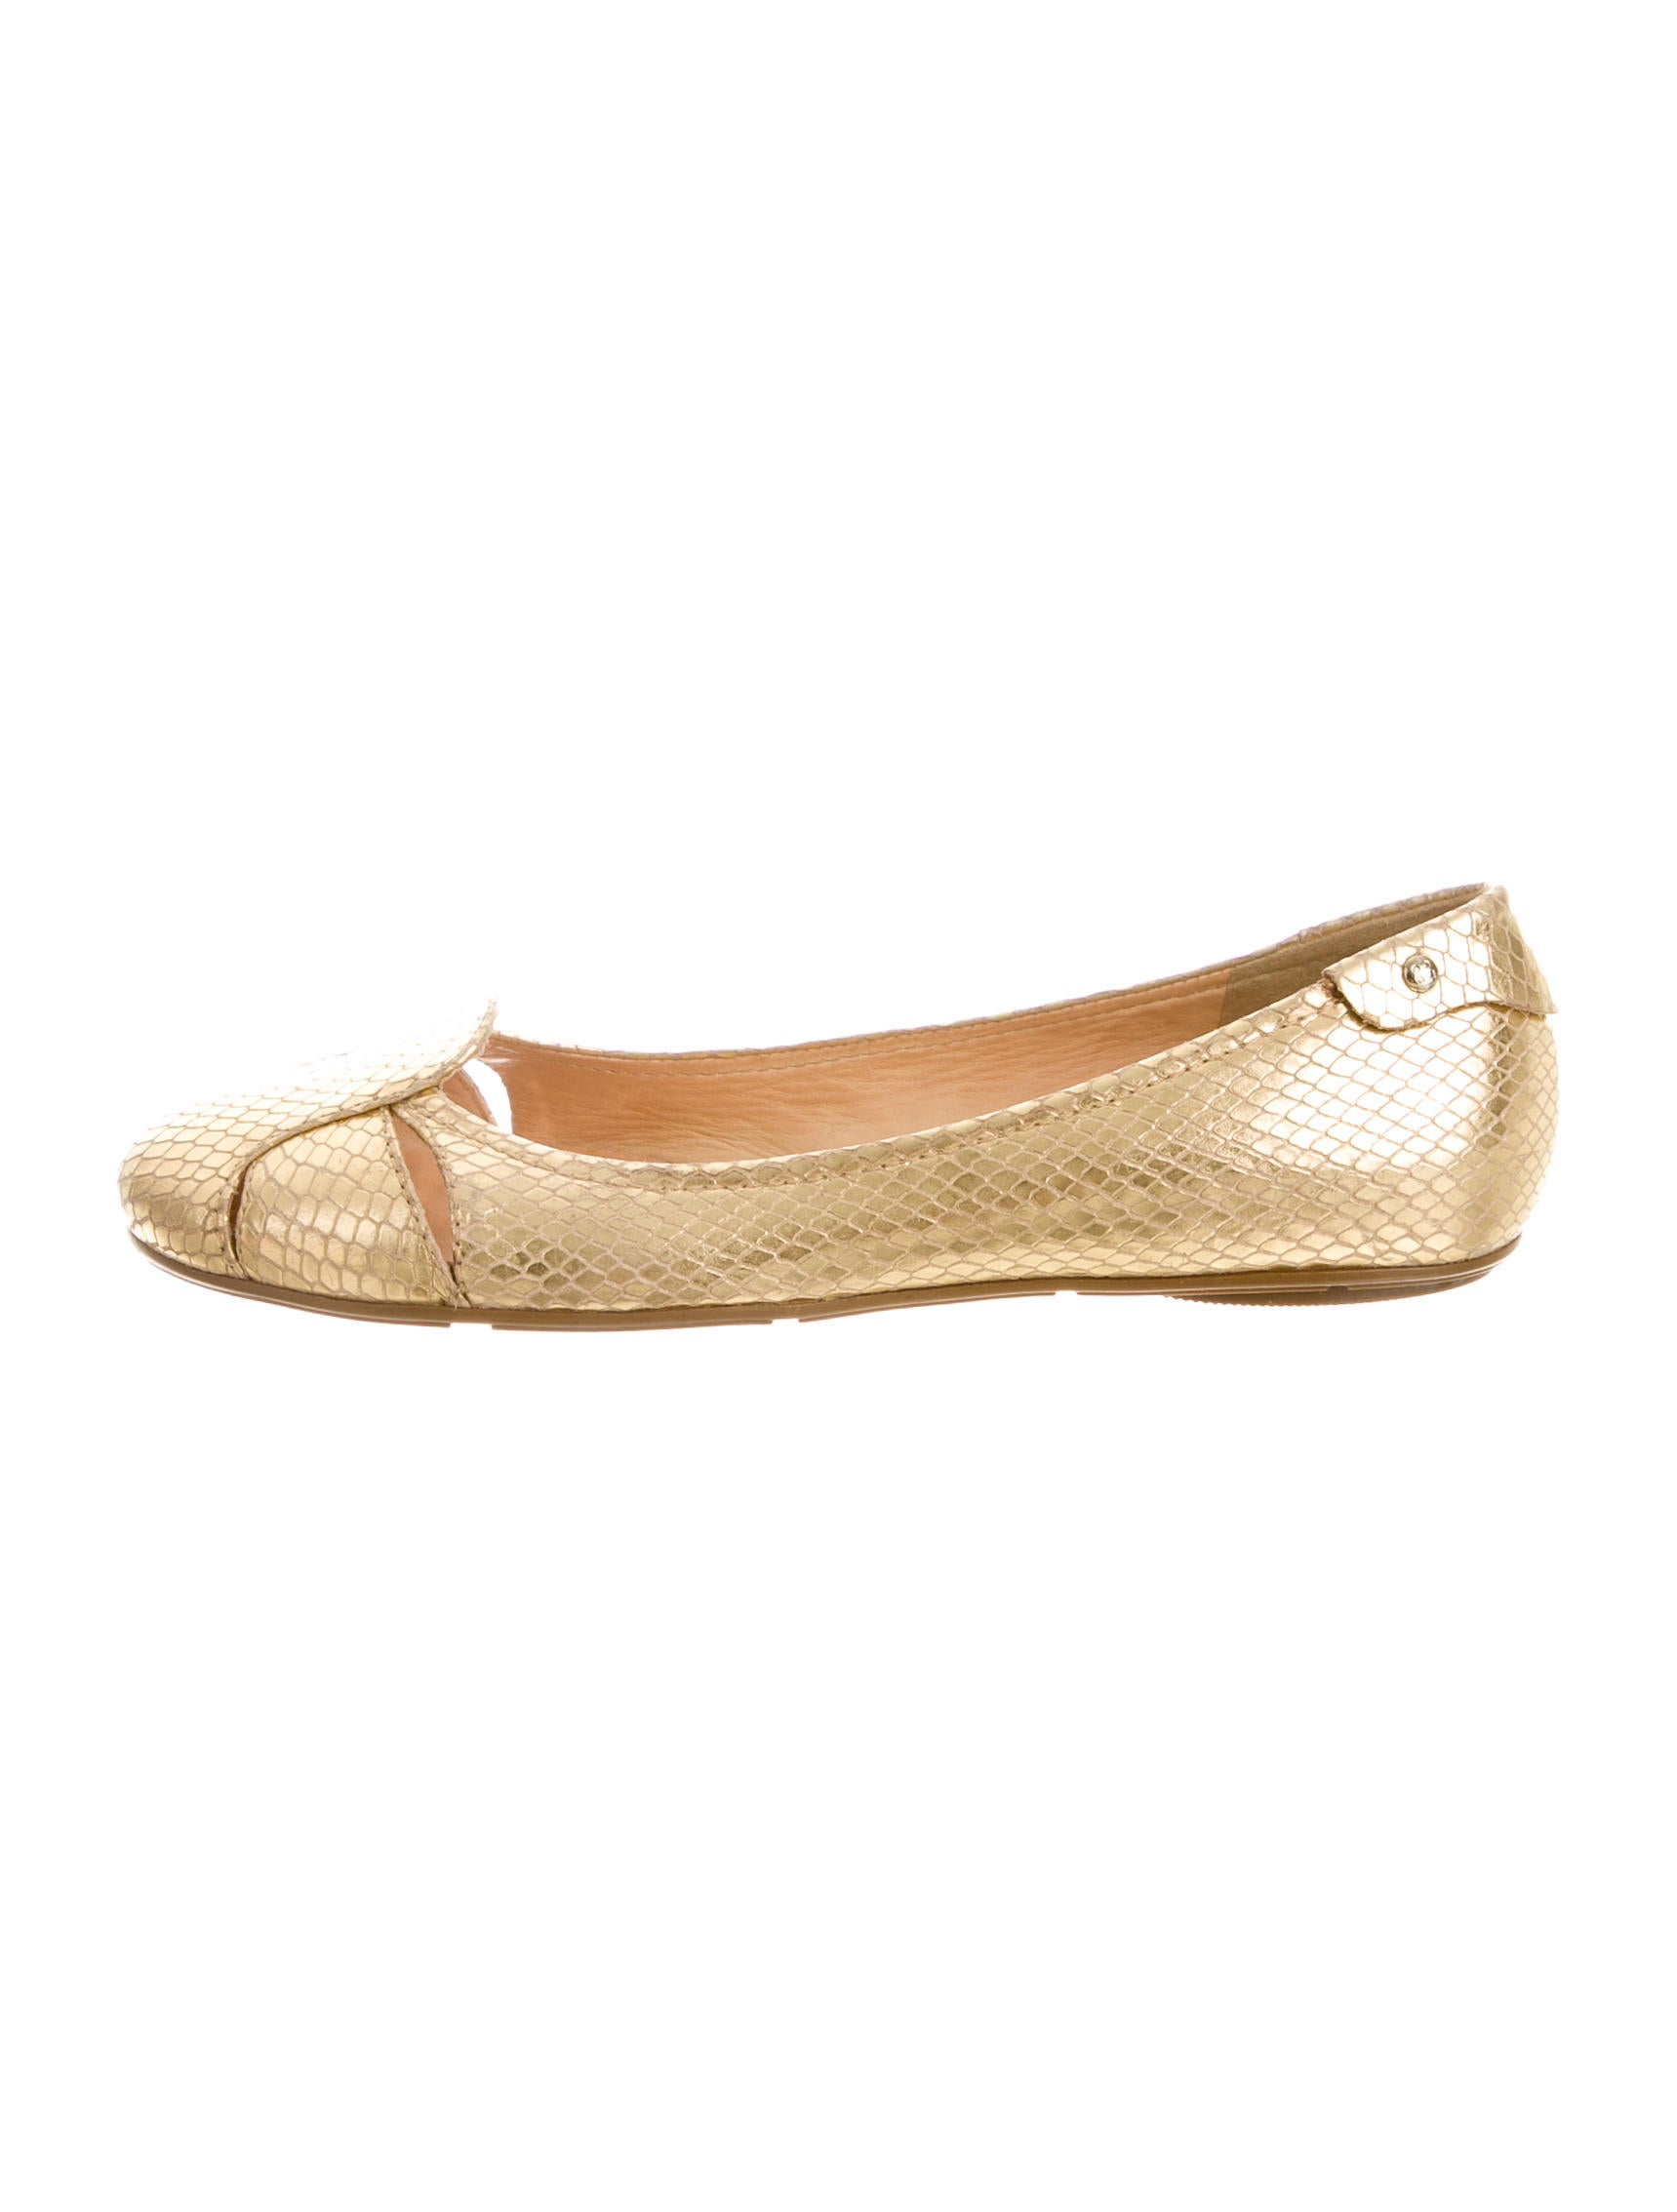 Kate spade new york metallic leather round toe flats for Kate spade new york flats